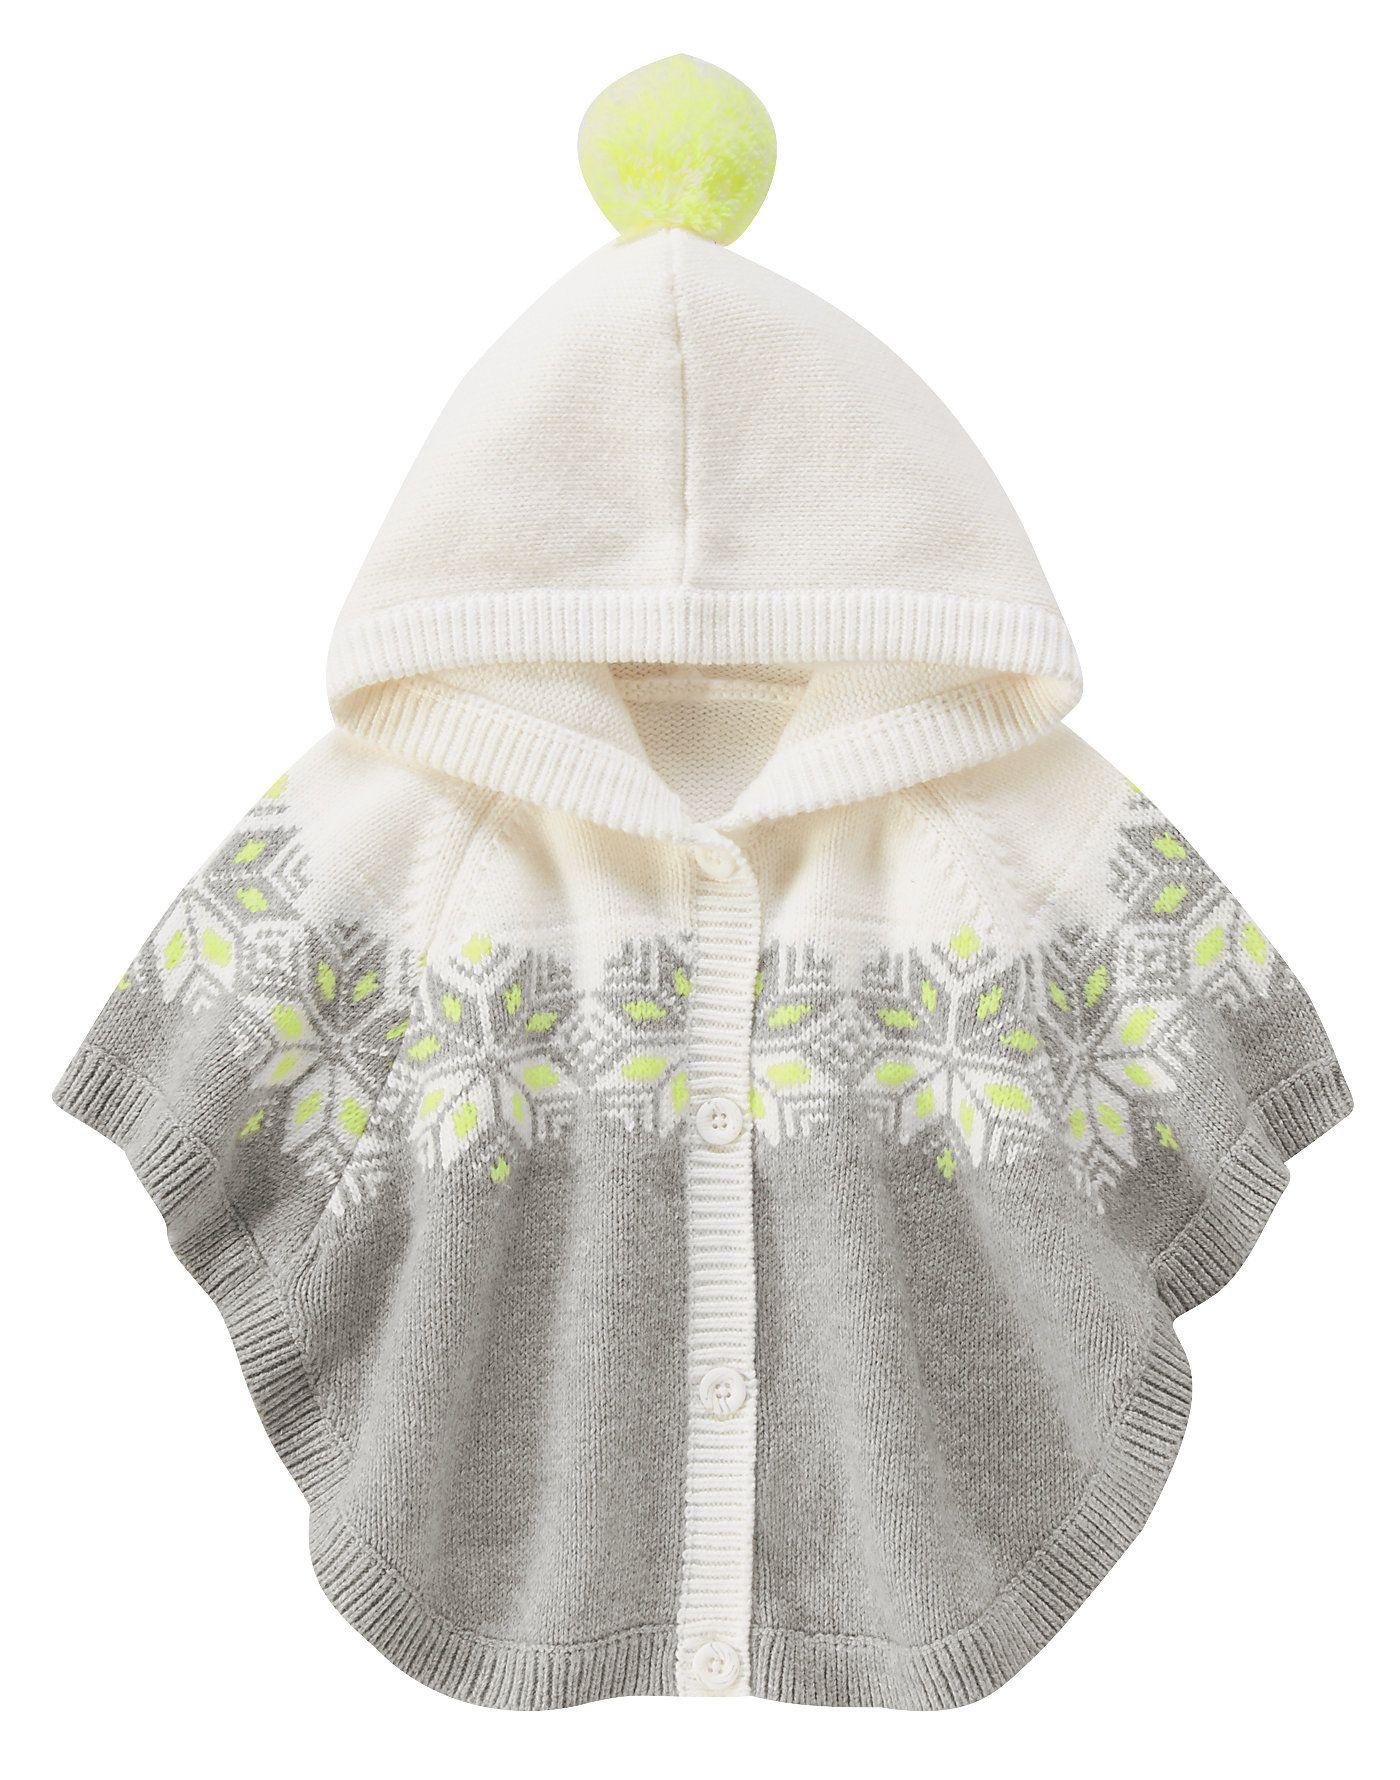 597c9e487be Snowflake Sweater Poncho at Gymboree